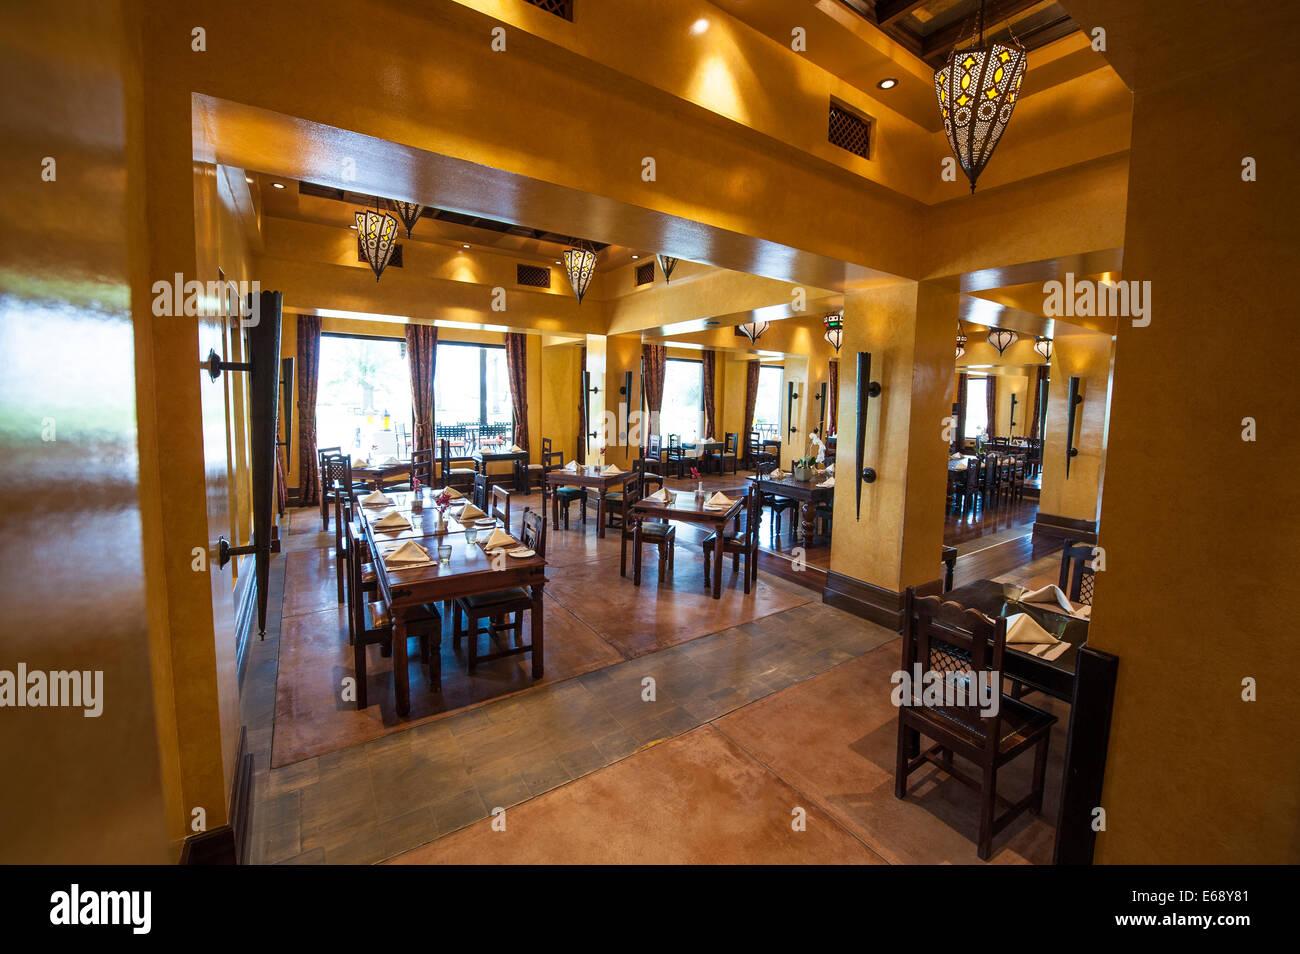 Dining Room Restaurant At The Bab Al Shams Desert Resort Spa Dubai United Arab Emirates UAE